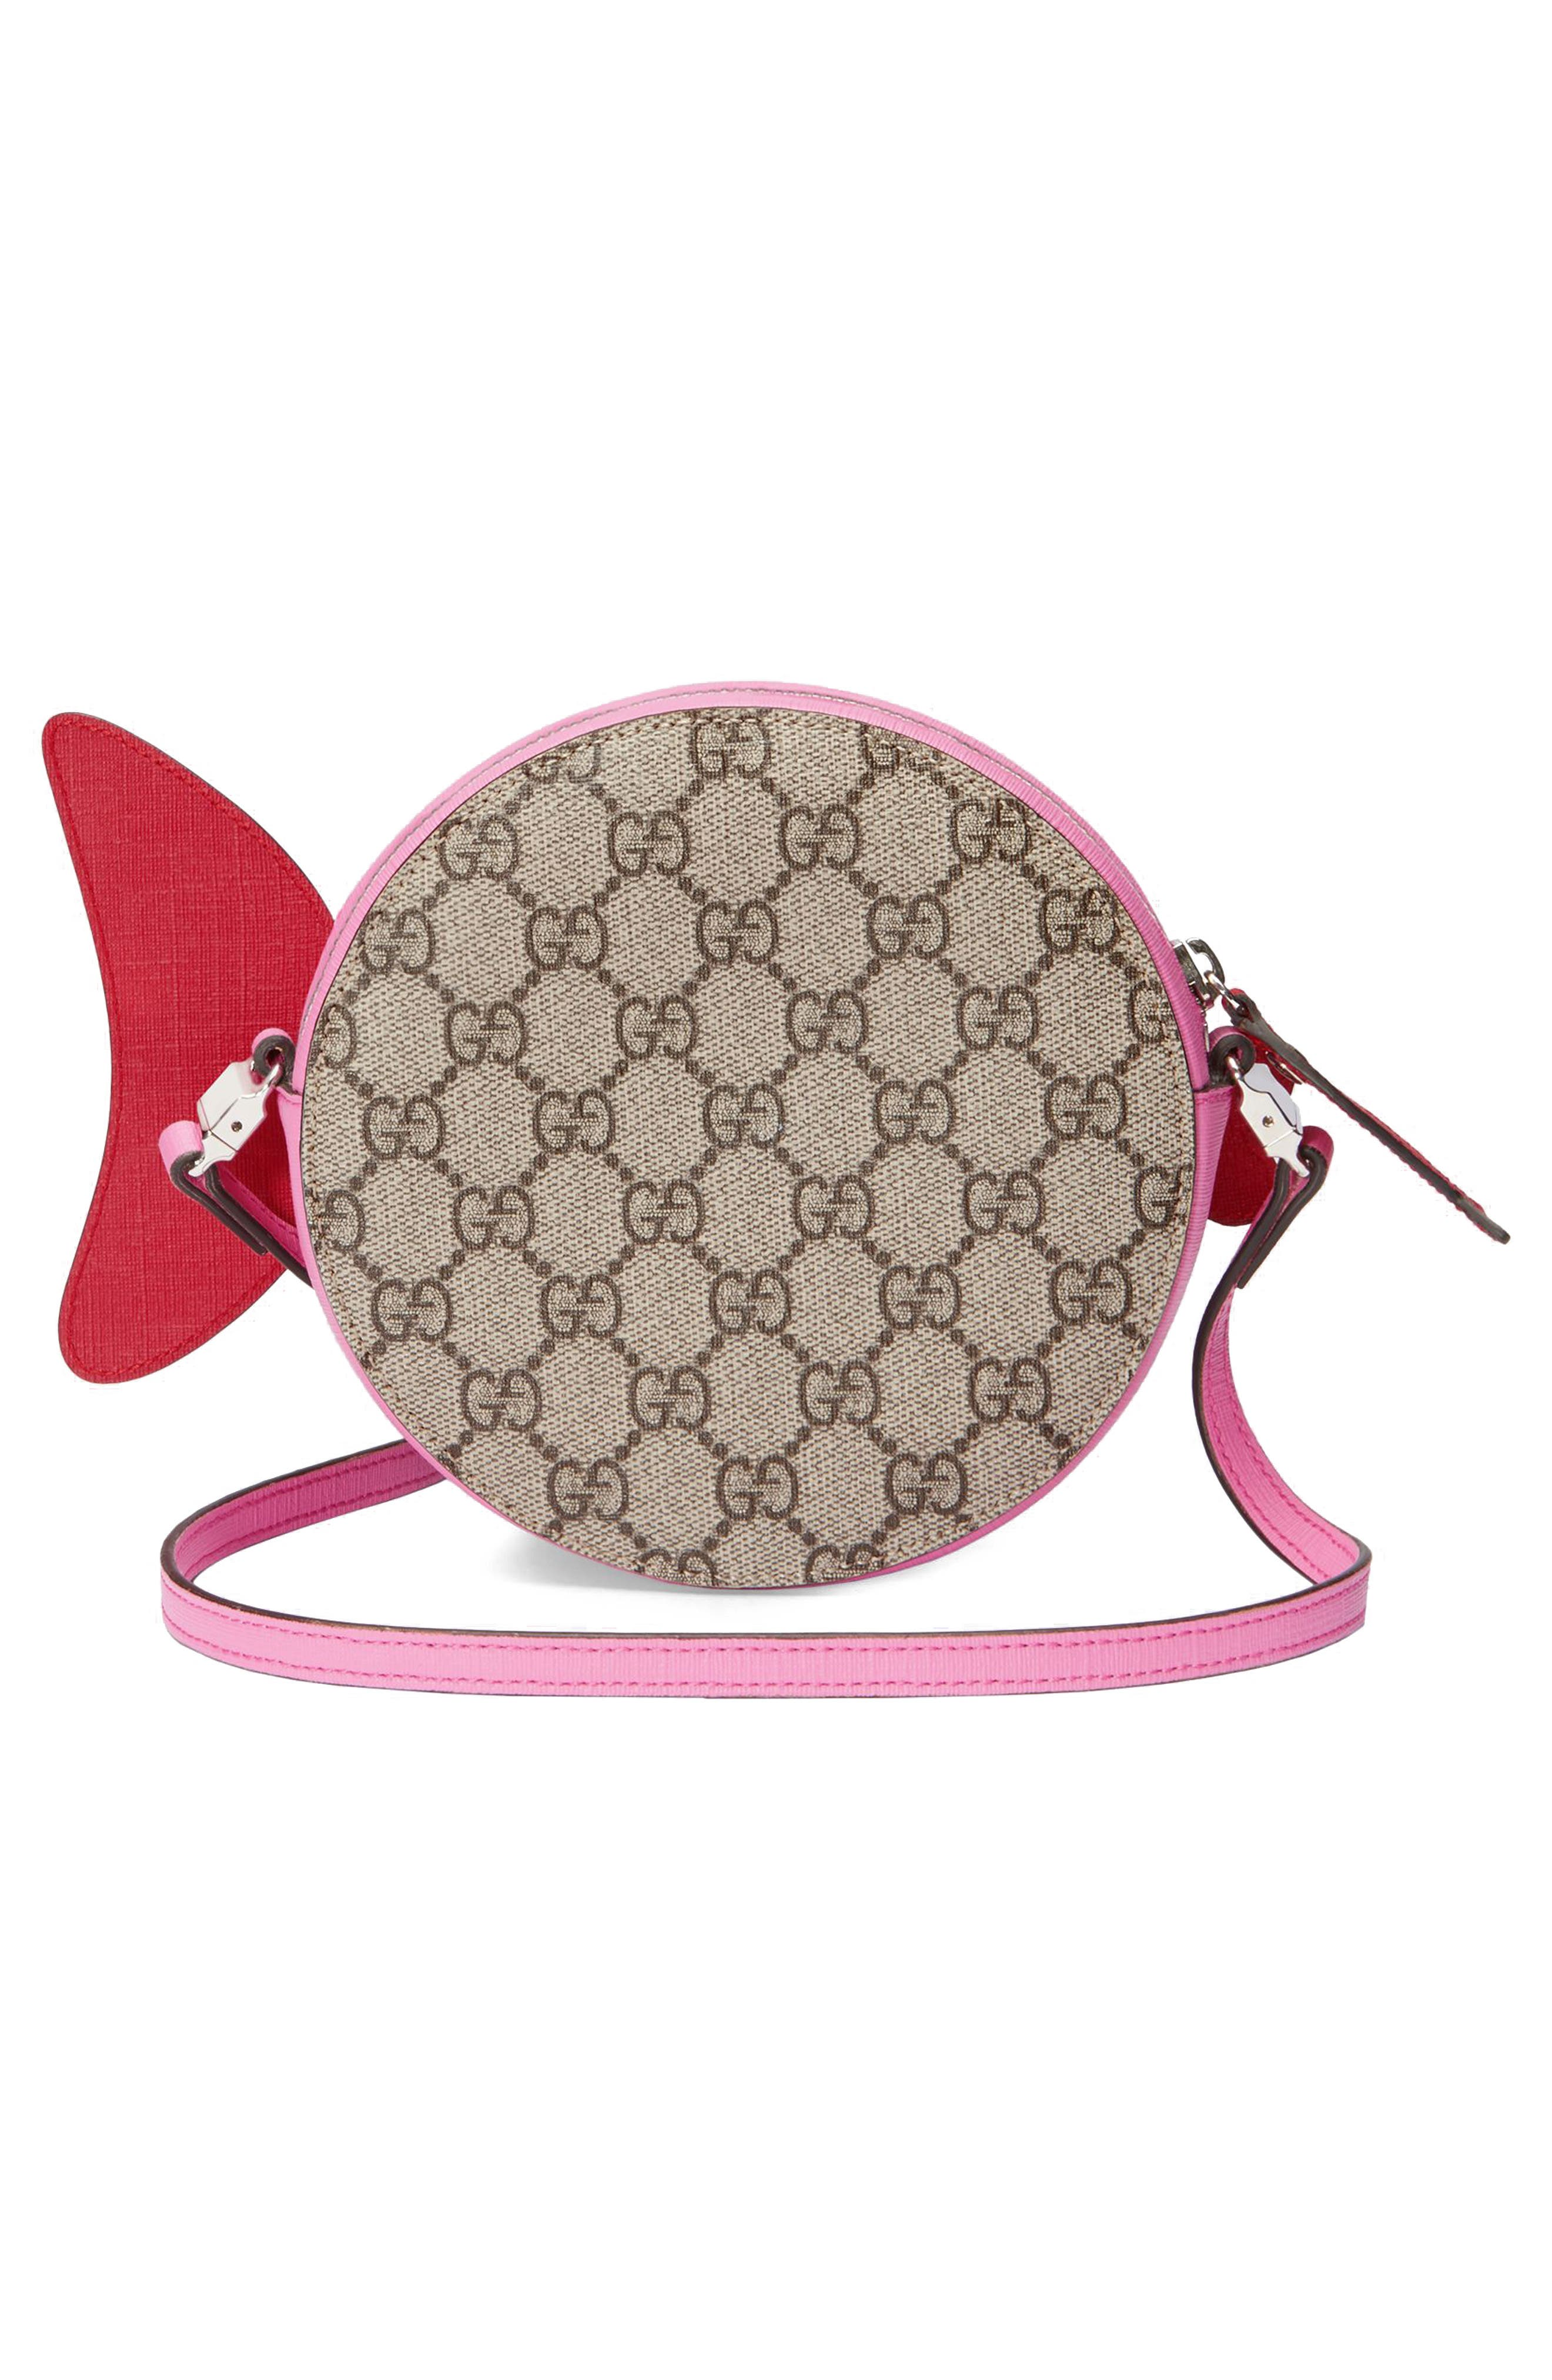 Gucci GG Supreme Fish Canvas Shoulder Bag,                             Alternate thumbnail 2, color,                             204